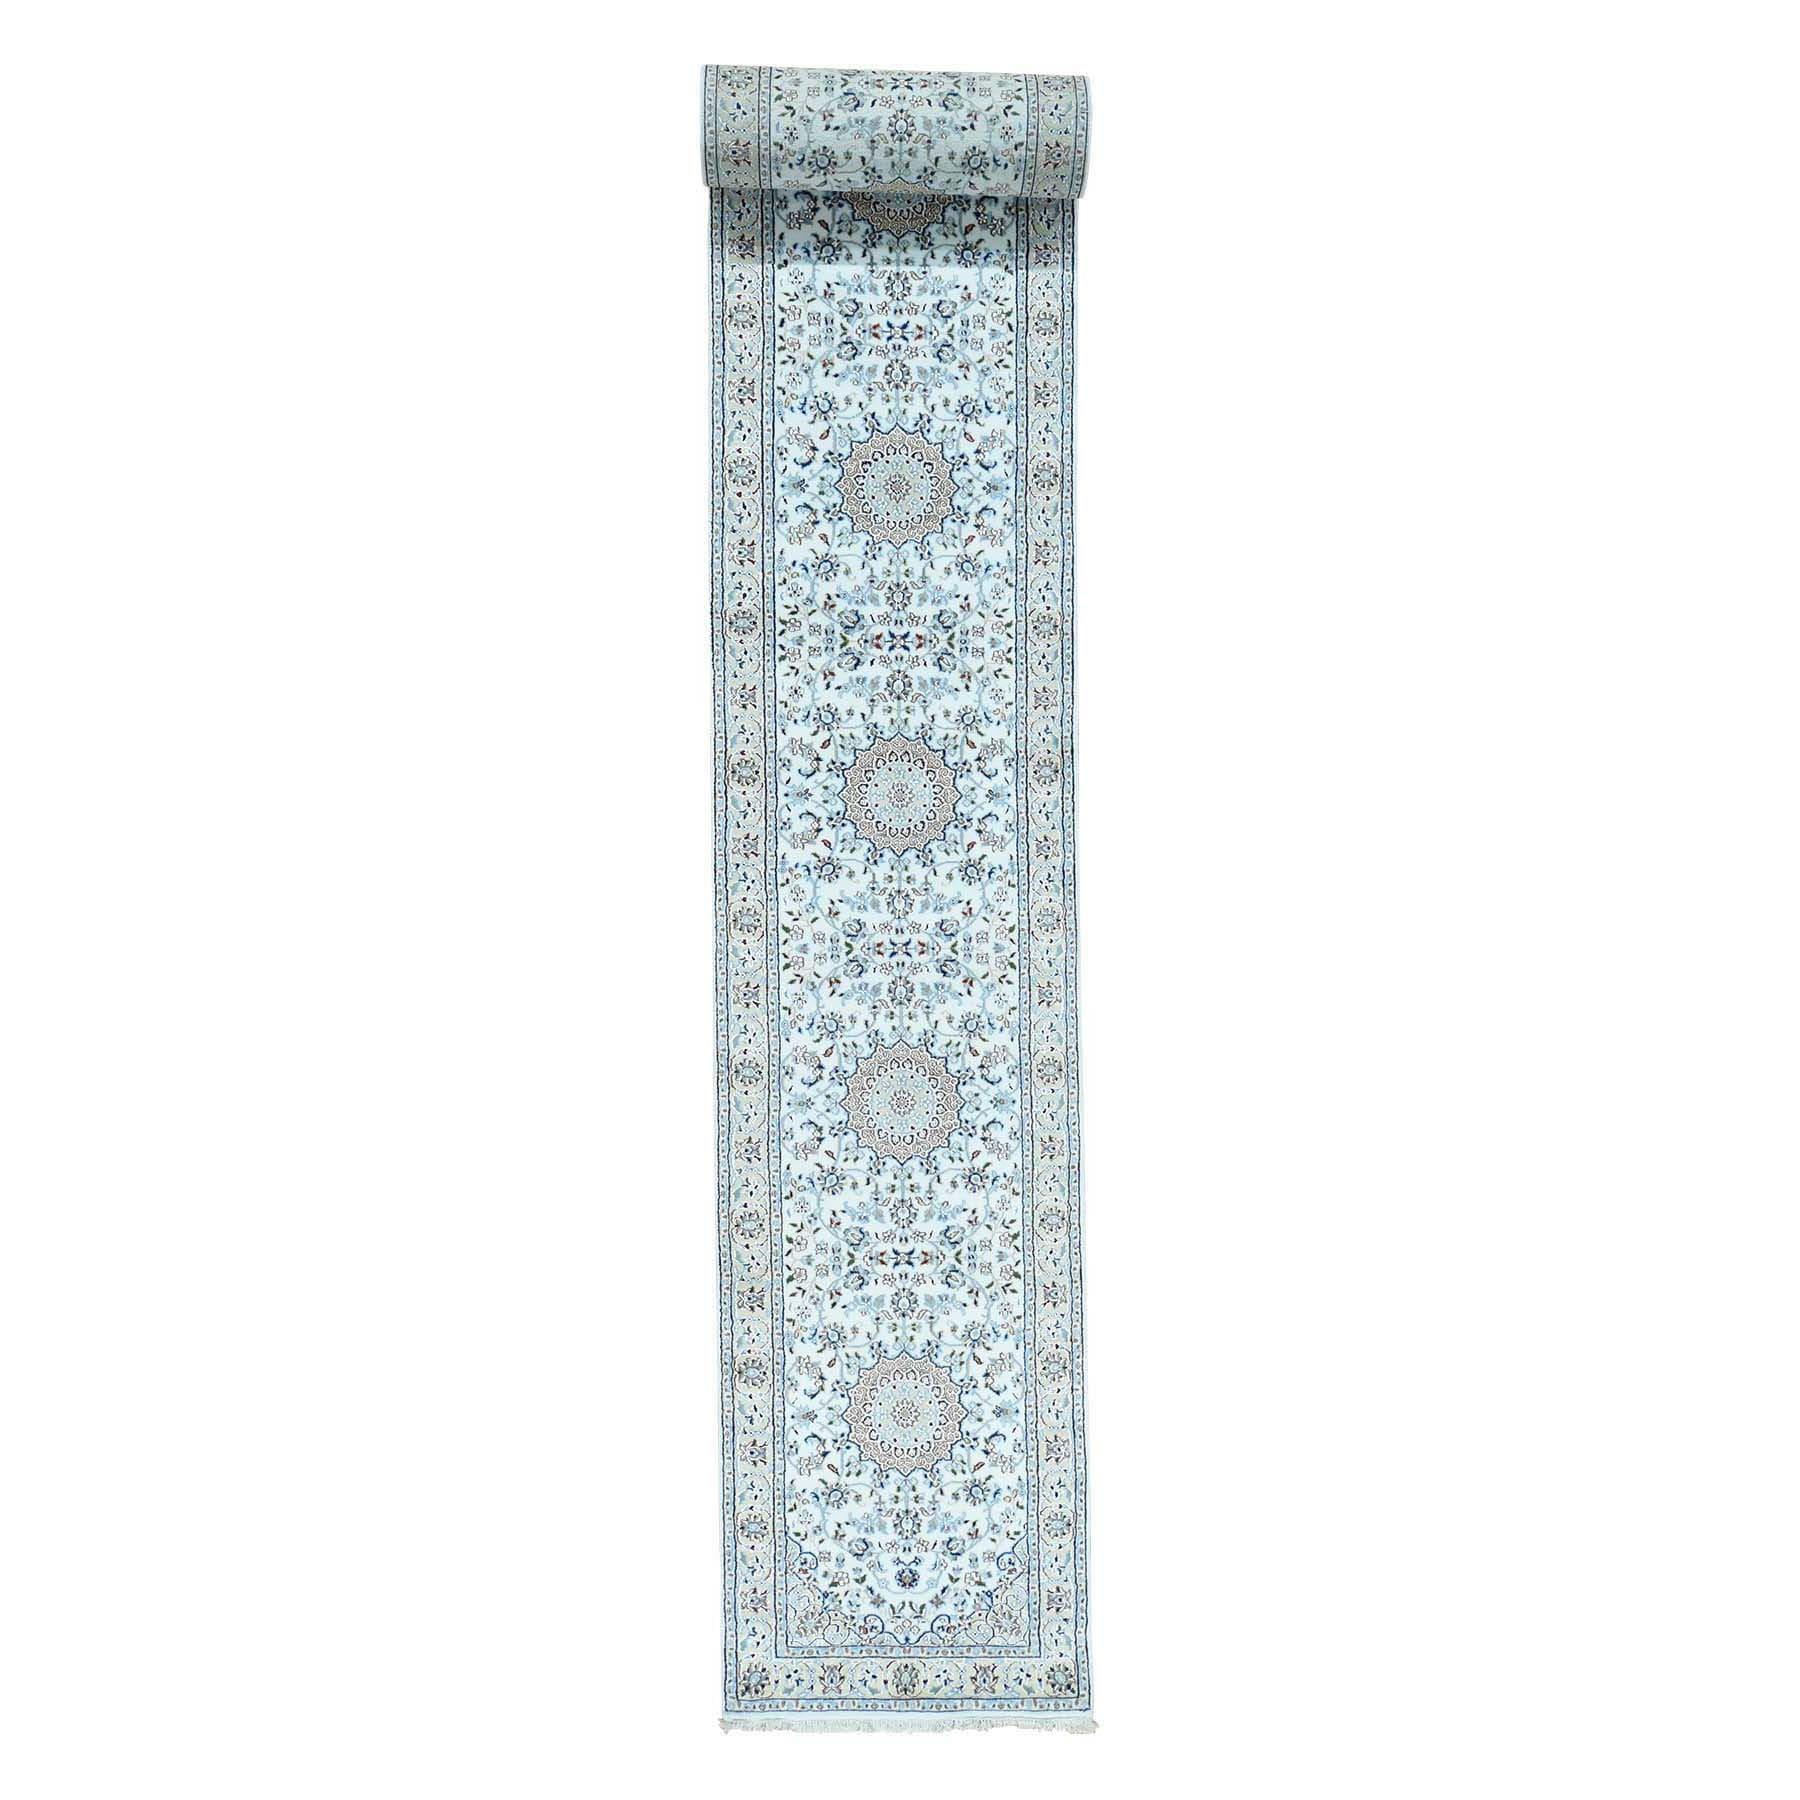 Shahbanu Rugs Hand-Knotted Wool and Silk 250 Kpsi Ivory Nain XL Runner Rug (2'7x18'0)